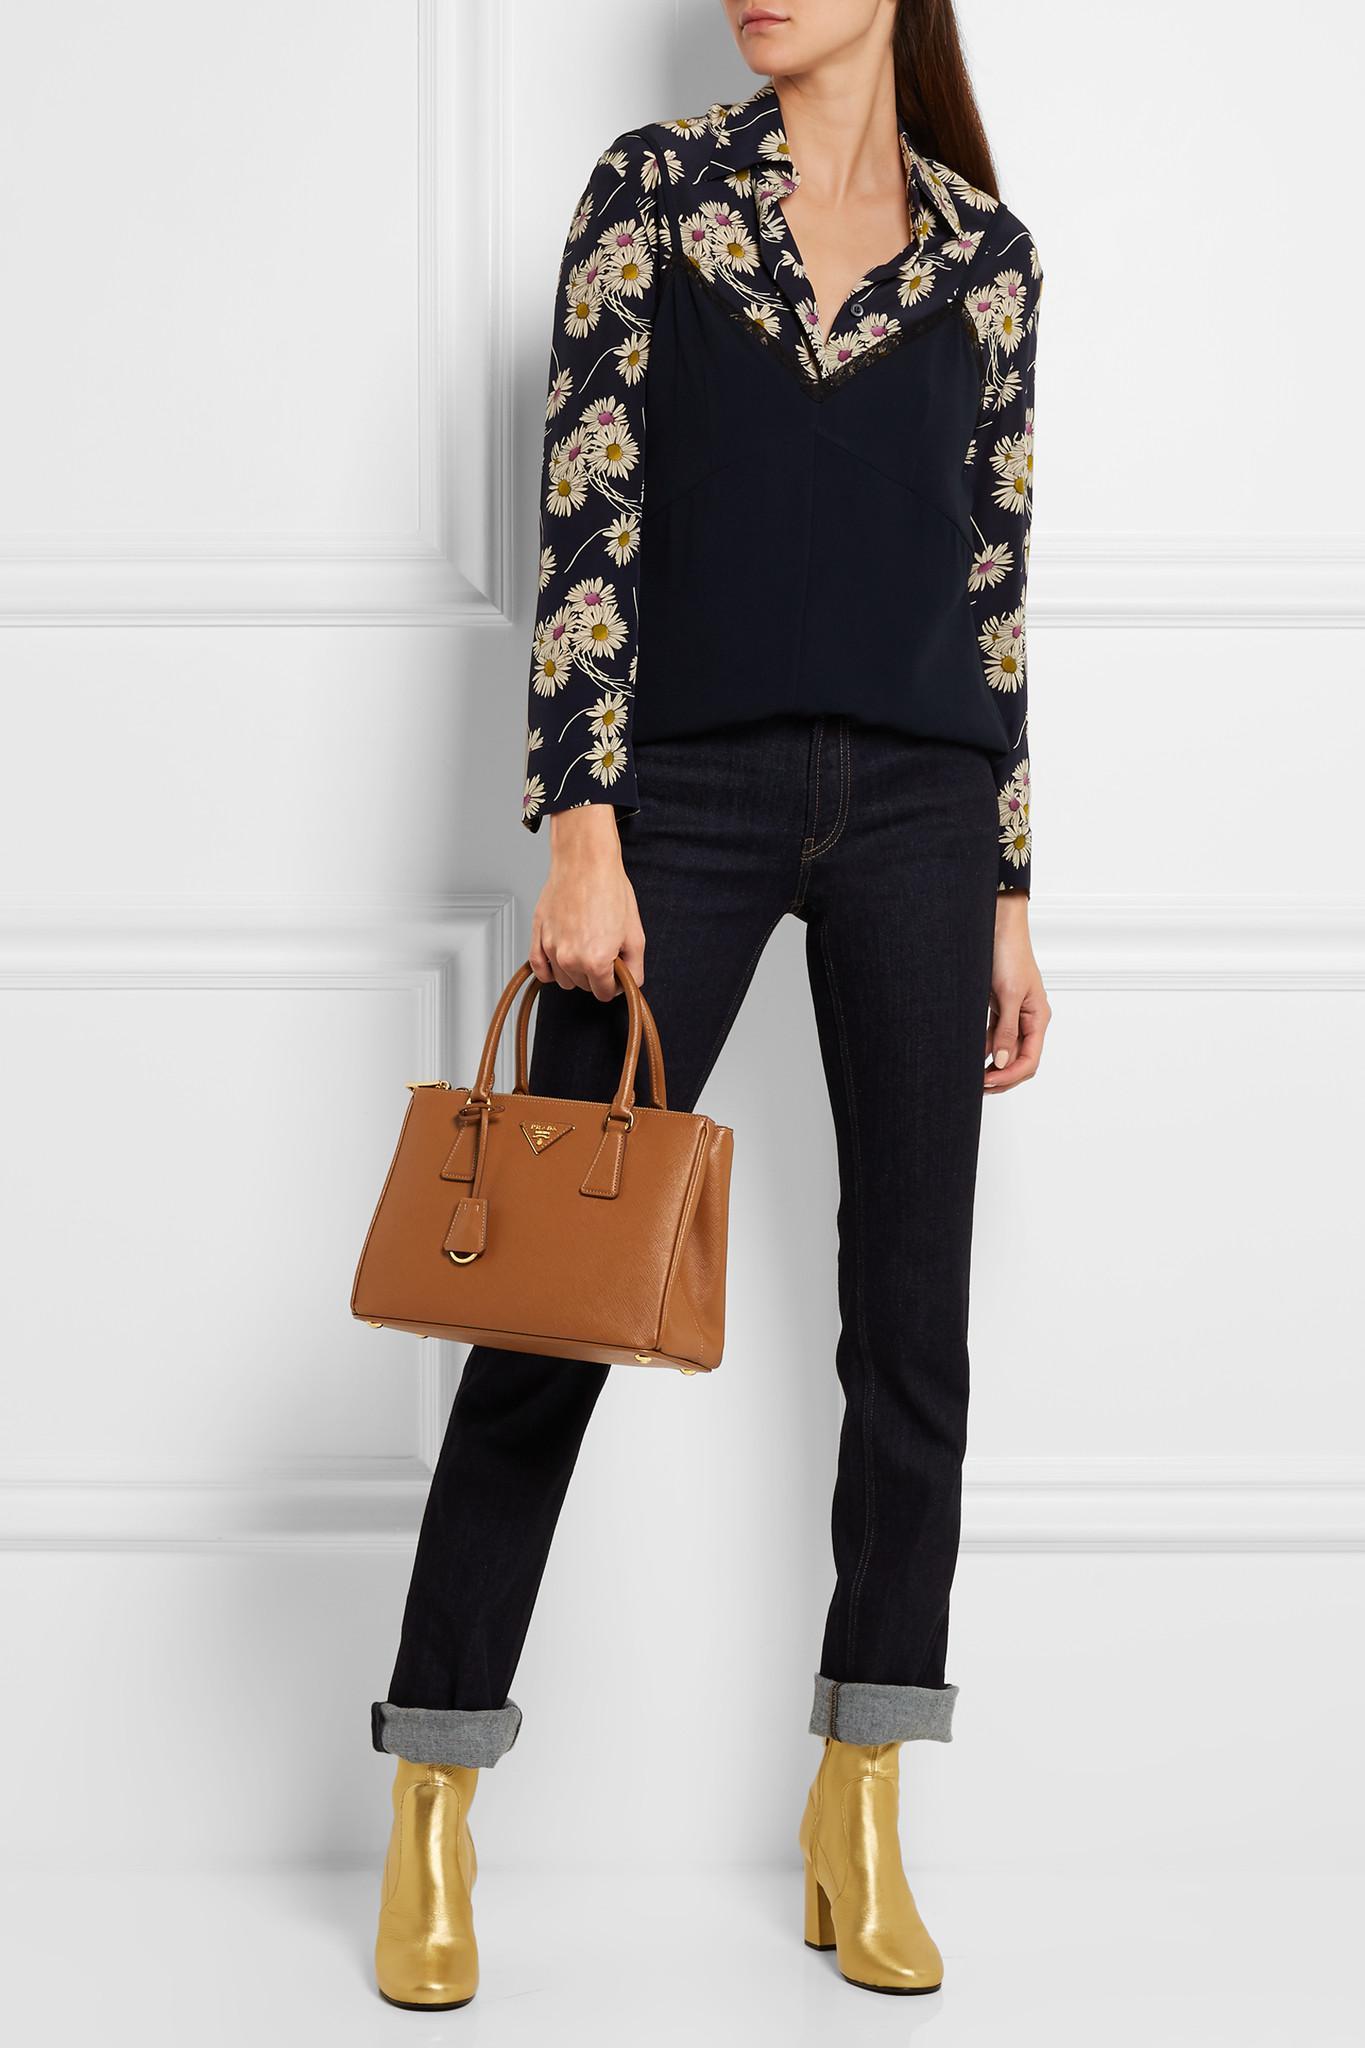 9b15f1a3cc56 Lyst - Prada Galleria Saffiano Leather Double Handle Tote in Brown